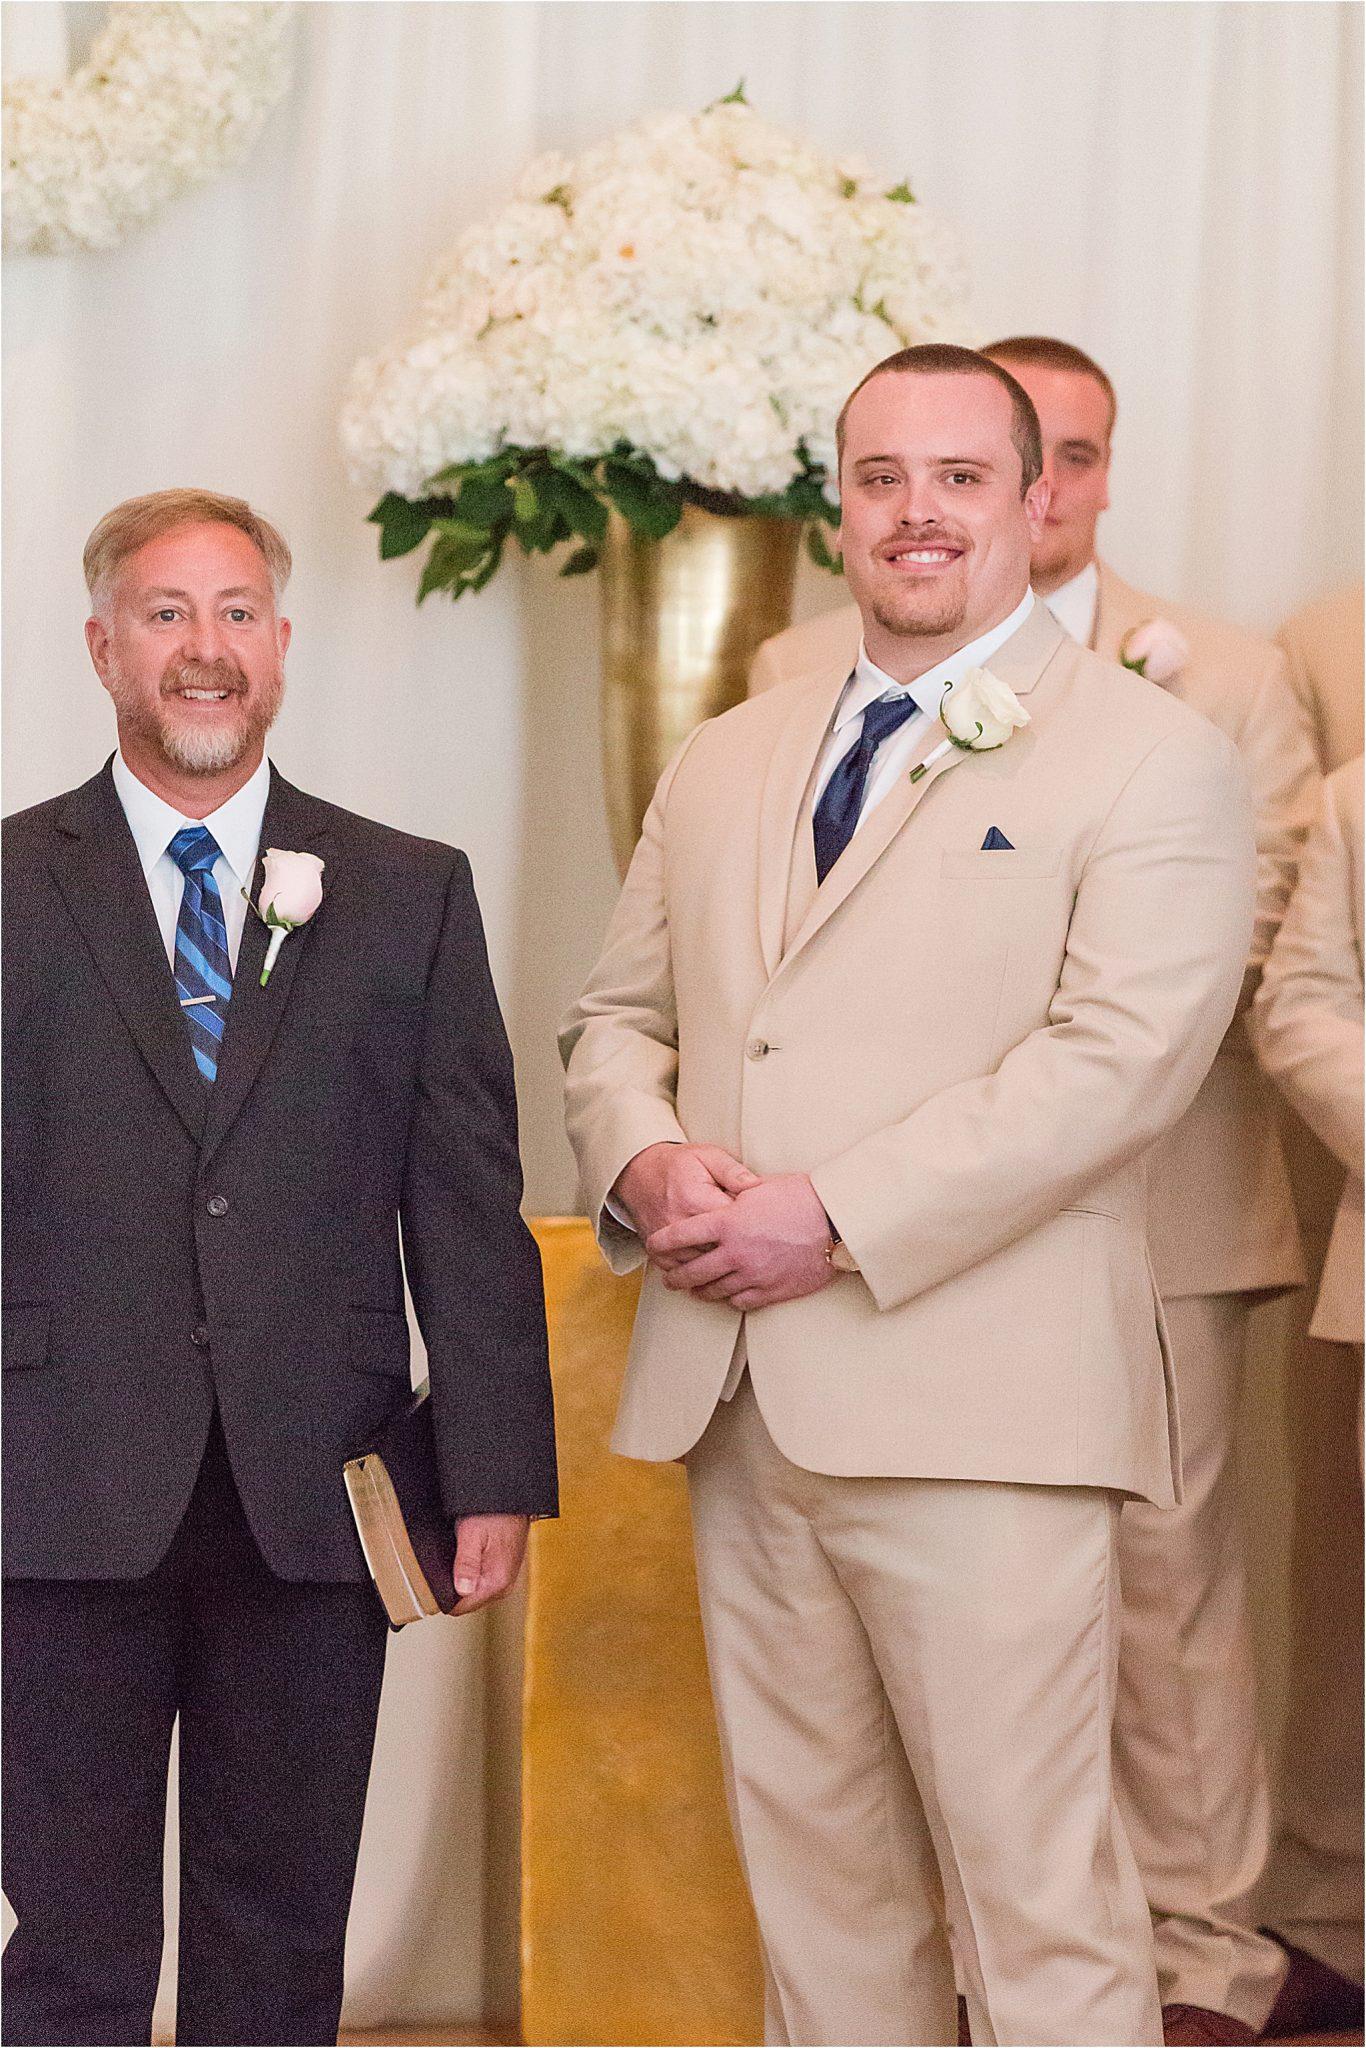 Sonnet House, Birmingham Alabama Wedding Photographer, Groom and groomsmen